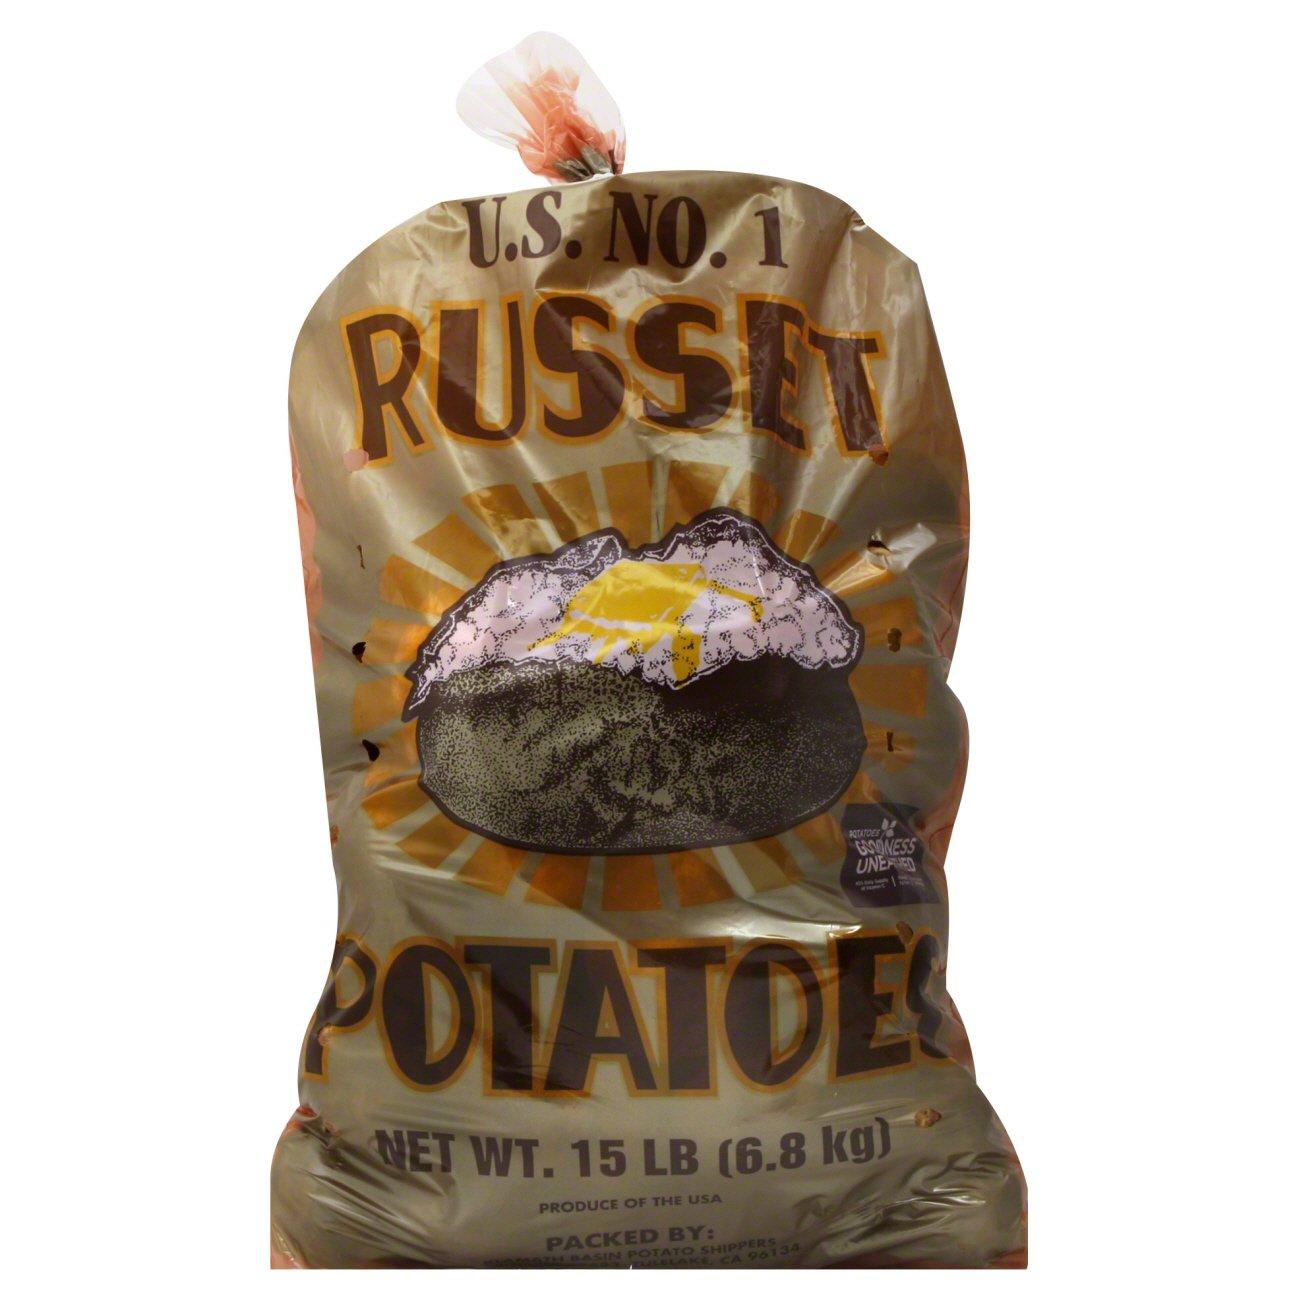 H E B Russet Potatoes Shop At HEB